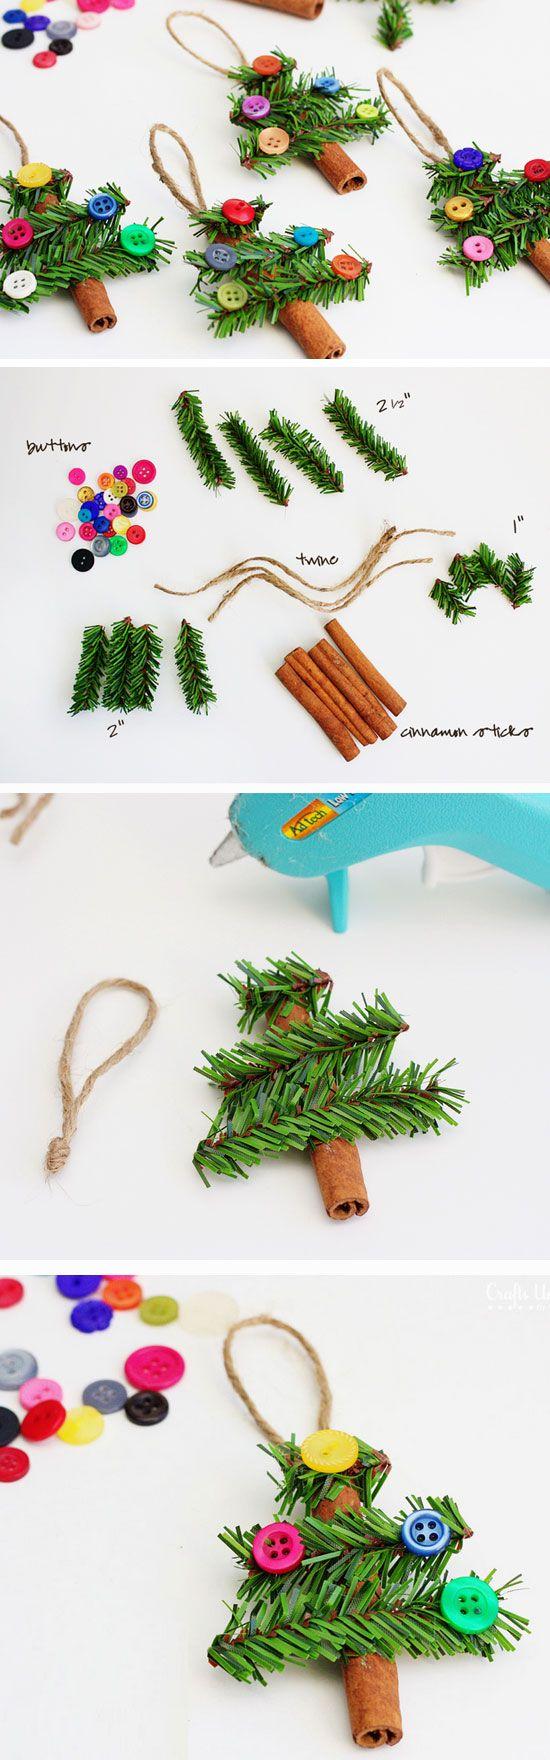 Cinnamon Stick Trees for Kids.